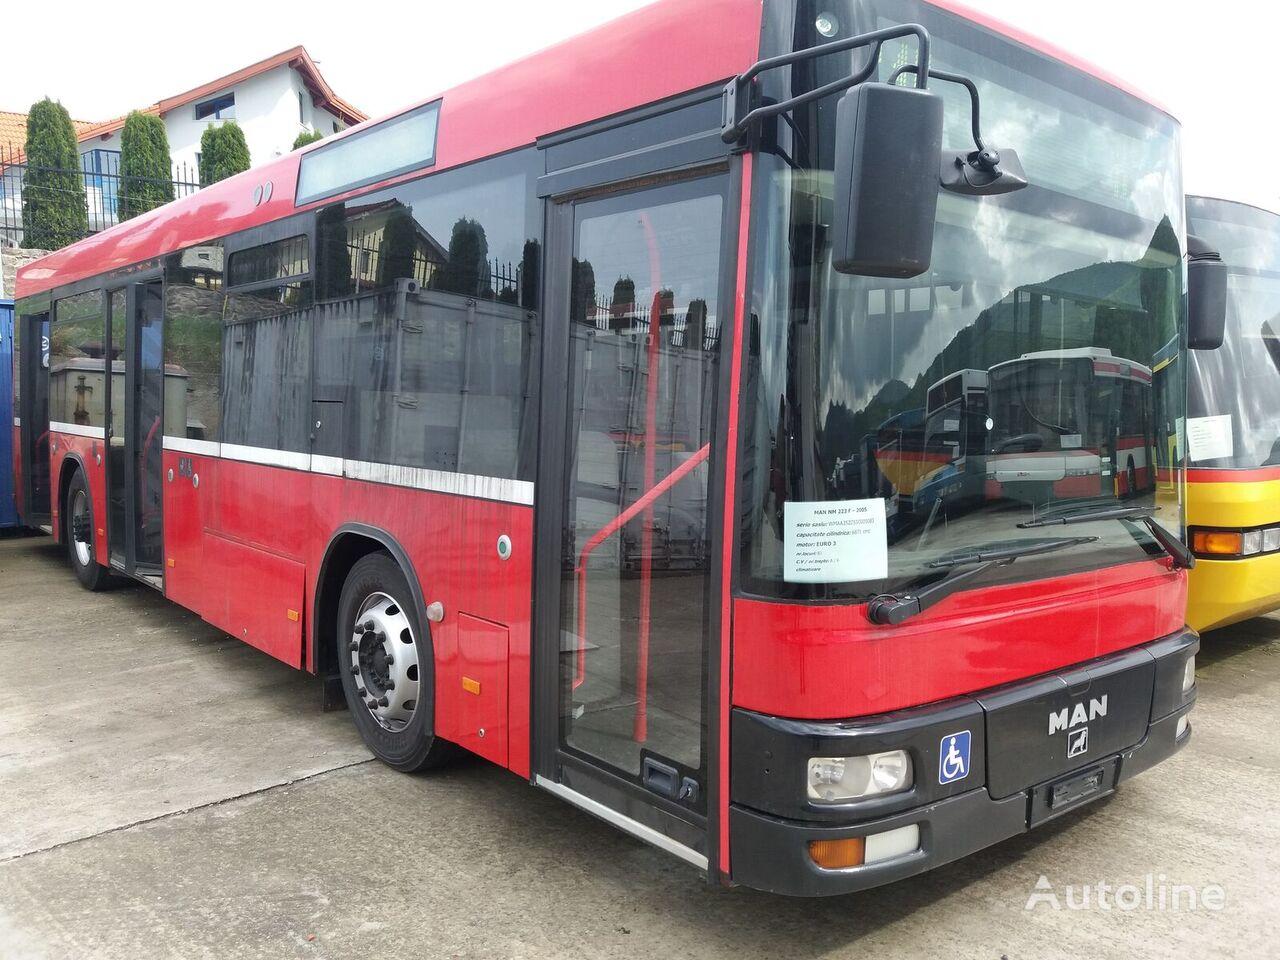 městský autobus MAN NM 223 F